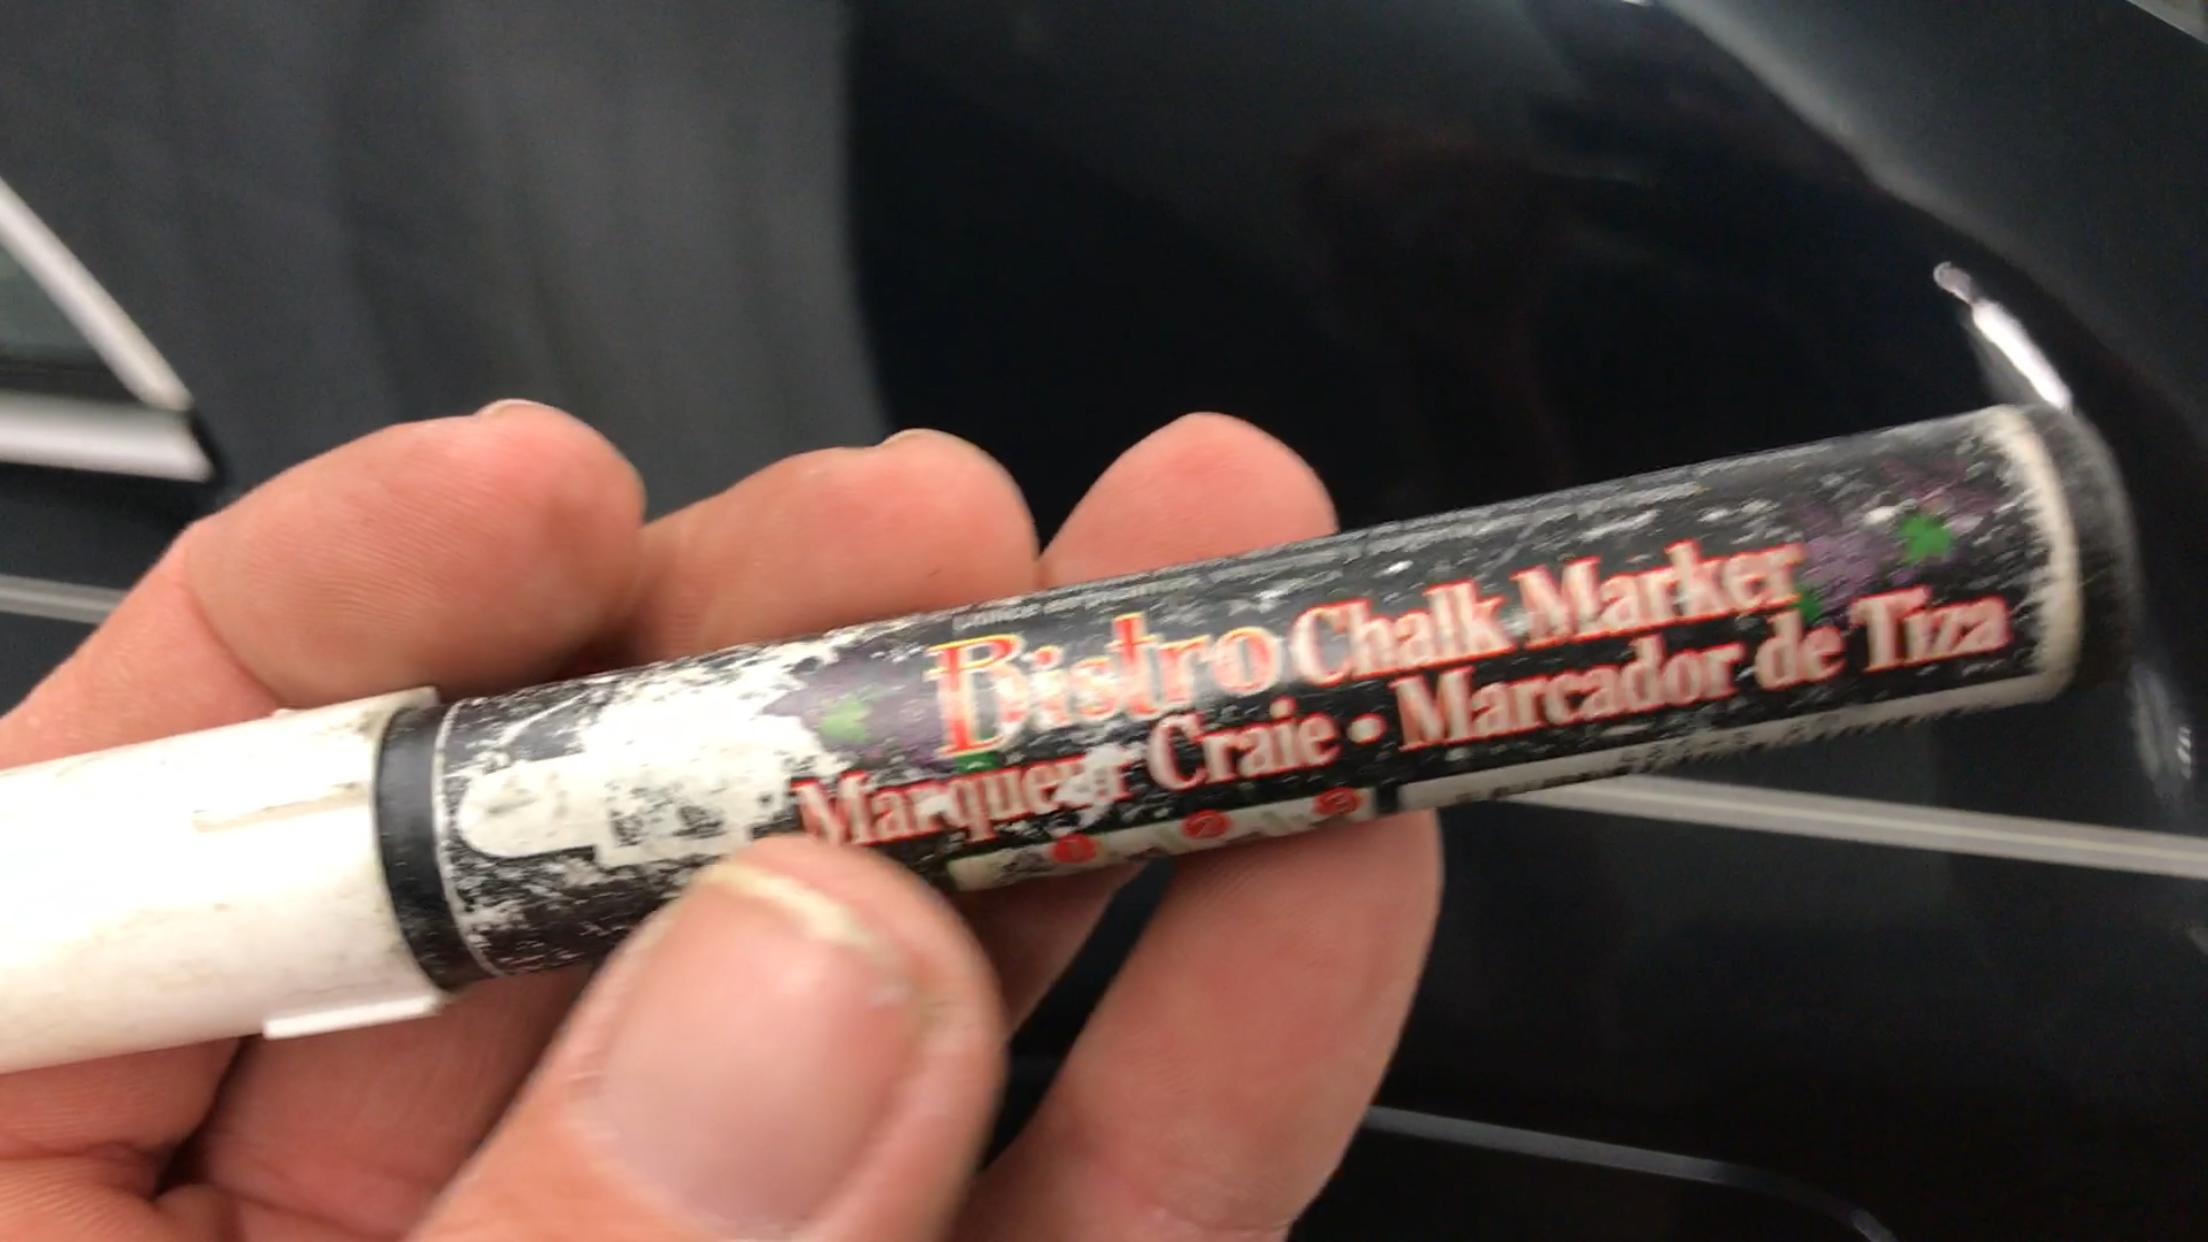 Chalk marker. http://217dent.com Springfield, IL